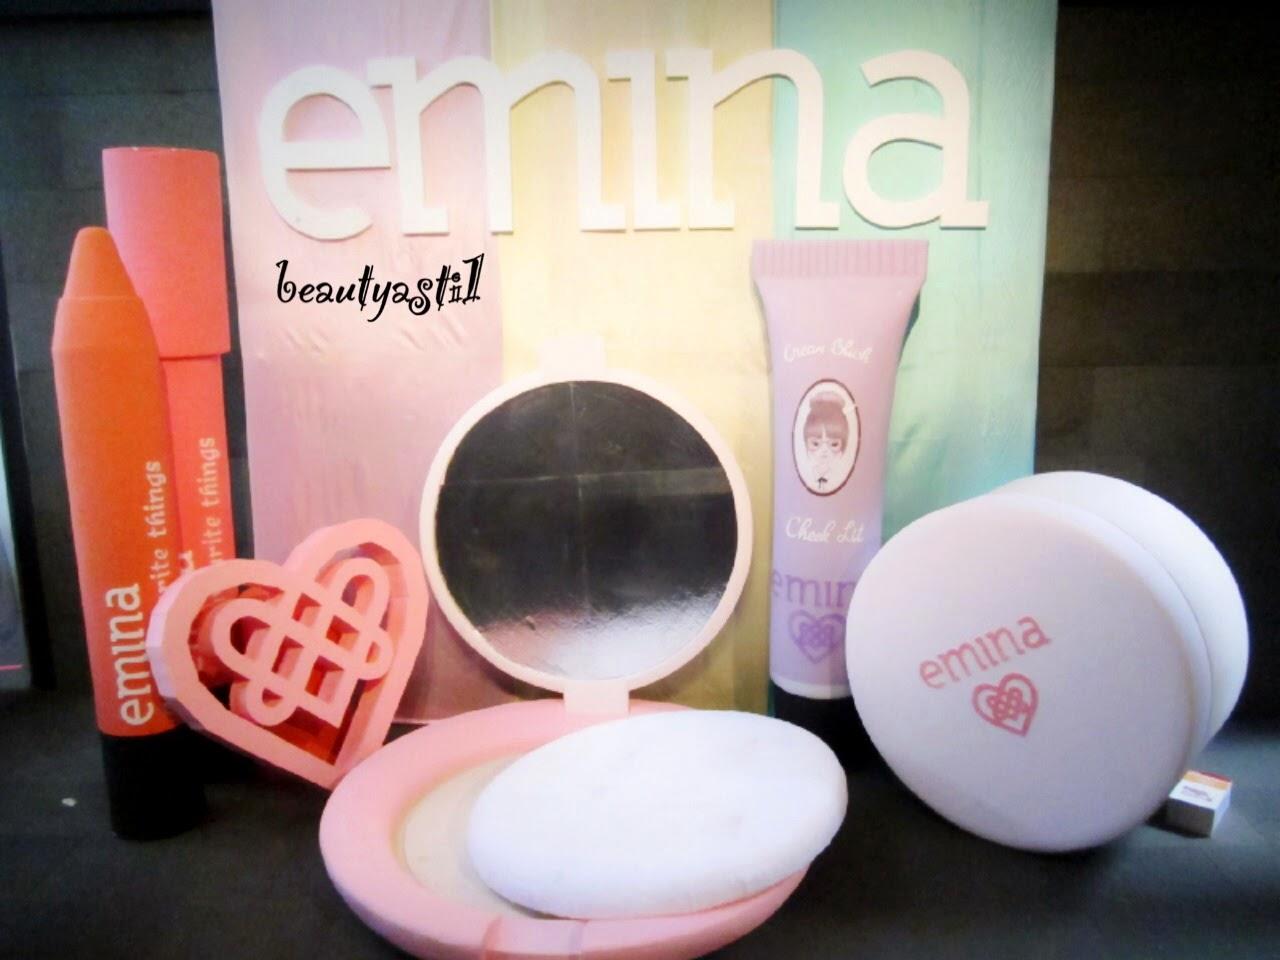 emina-cosmetics-x-sasyachi-beauty-event-at-dialogue-artspace.jpg